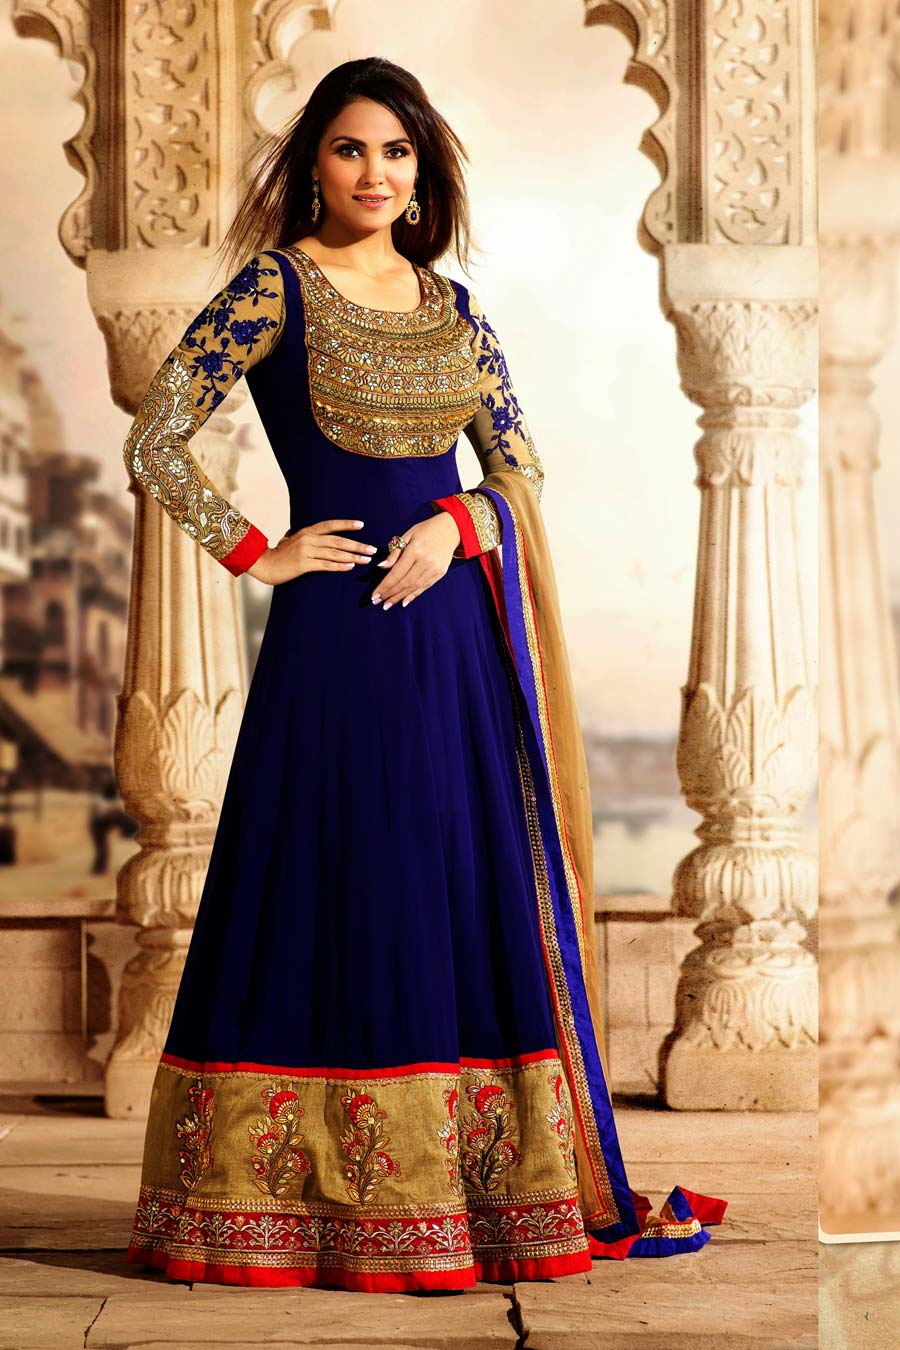 Royal-Blue-Designer-Dress.jpg